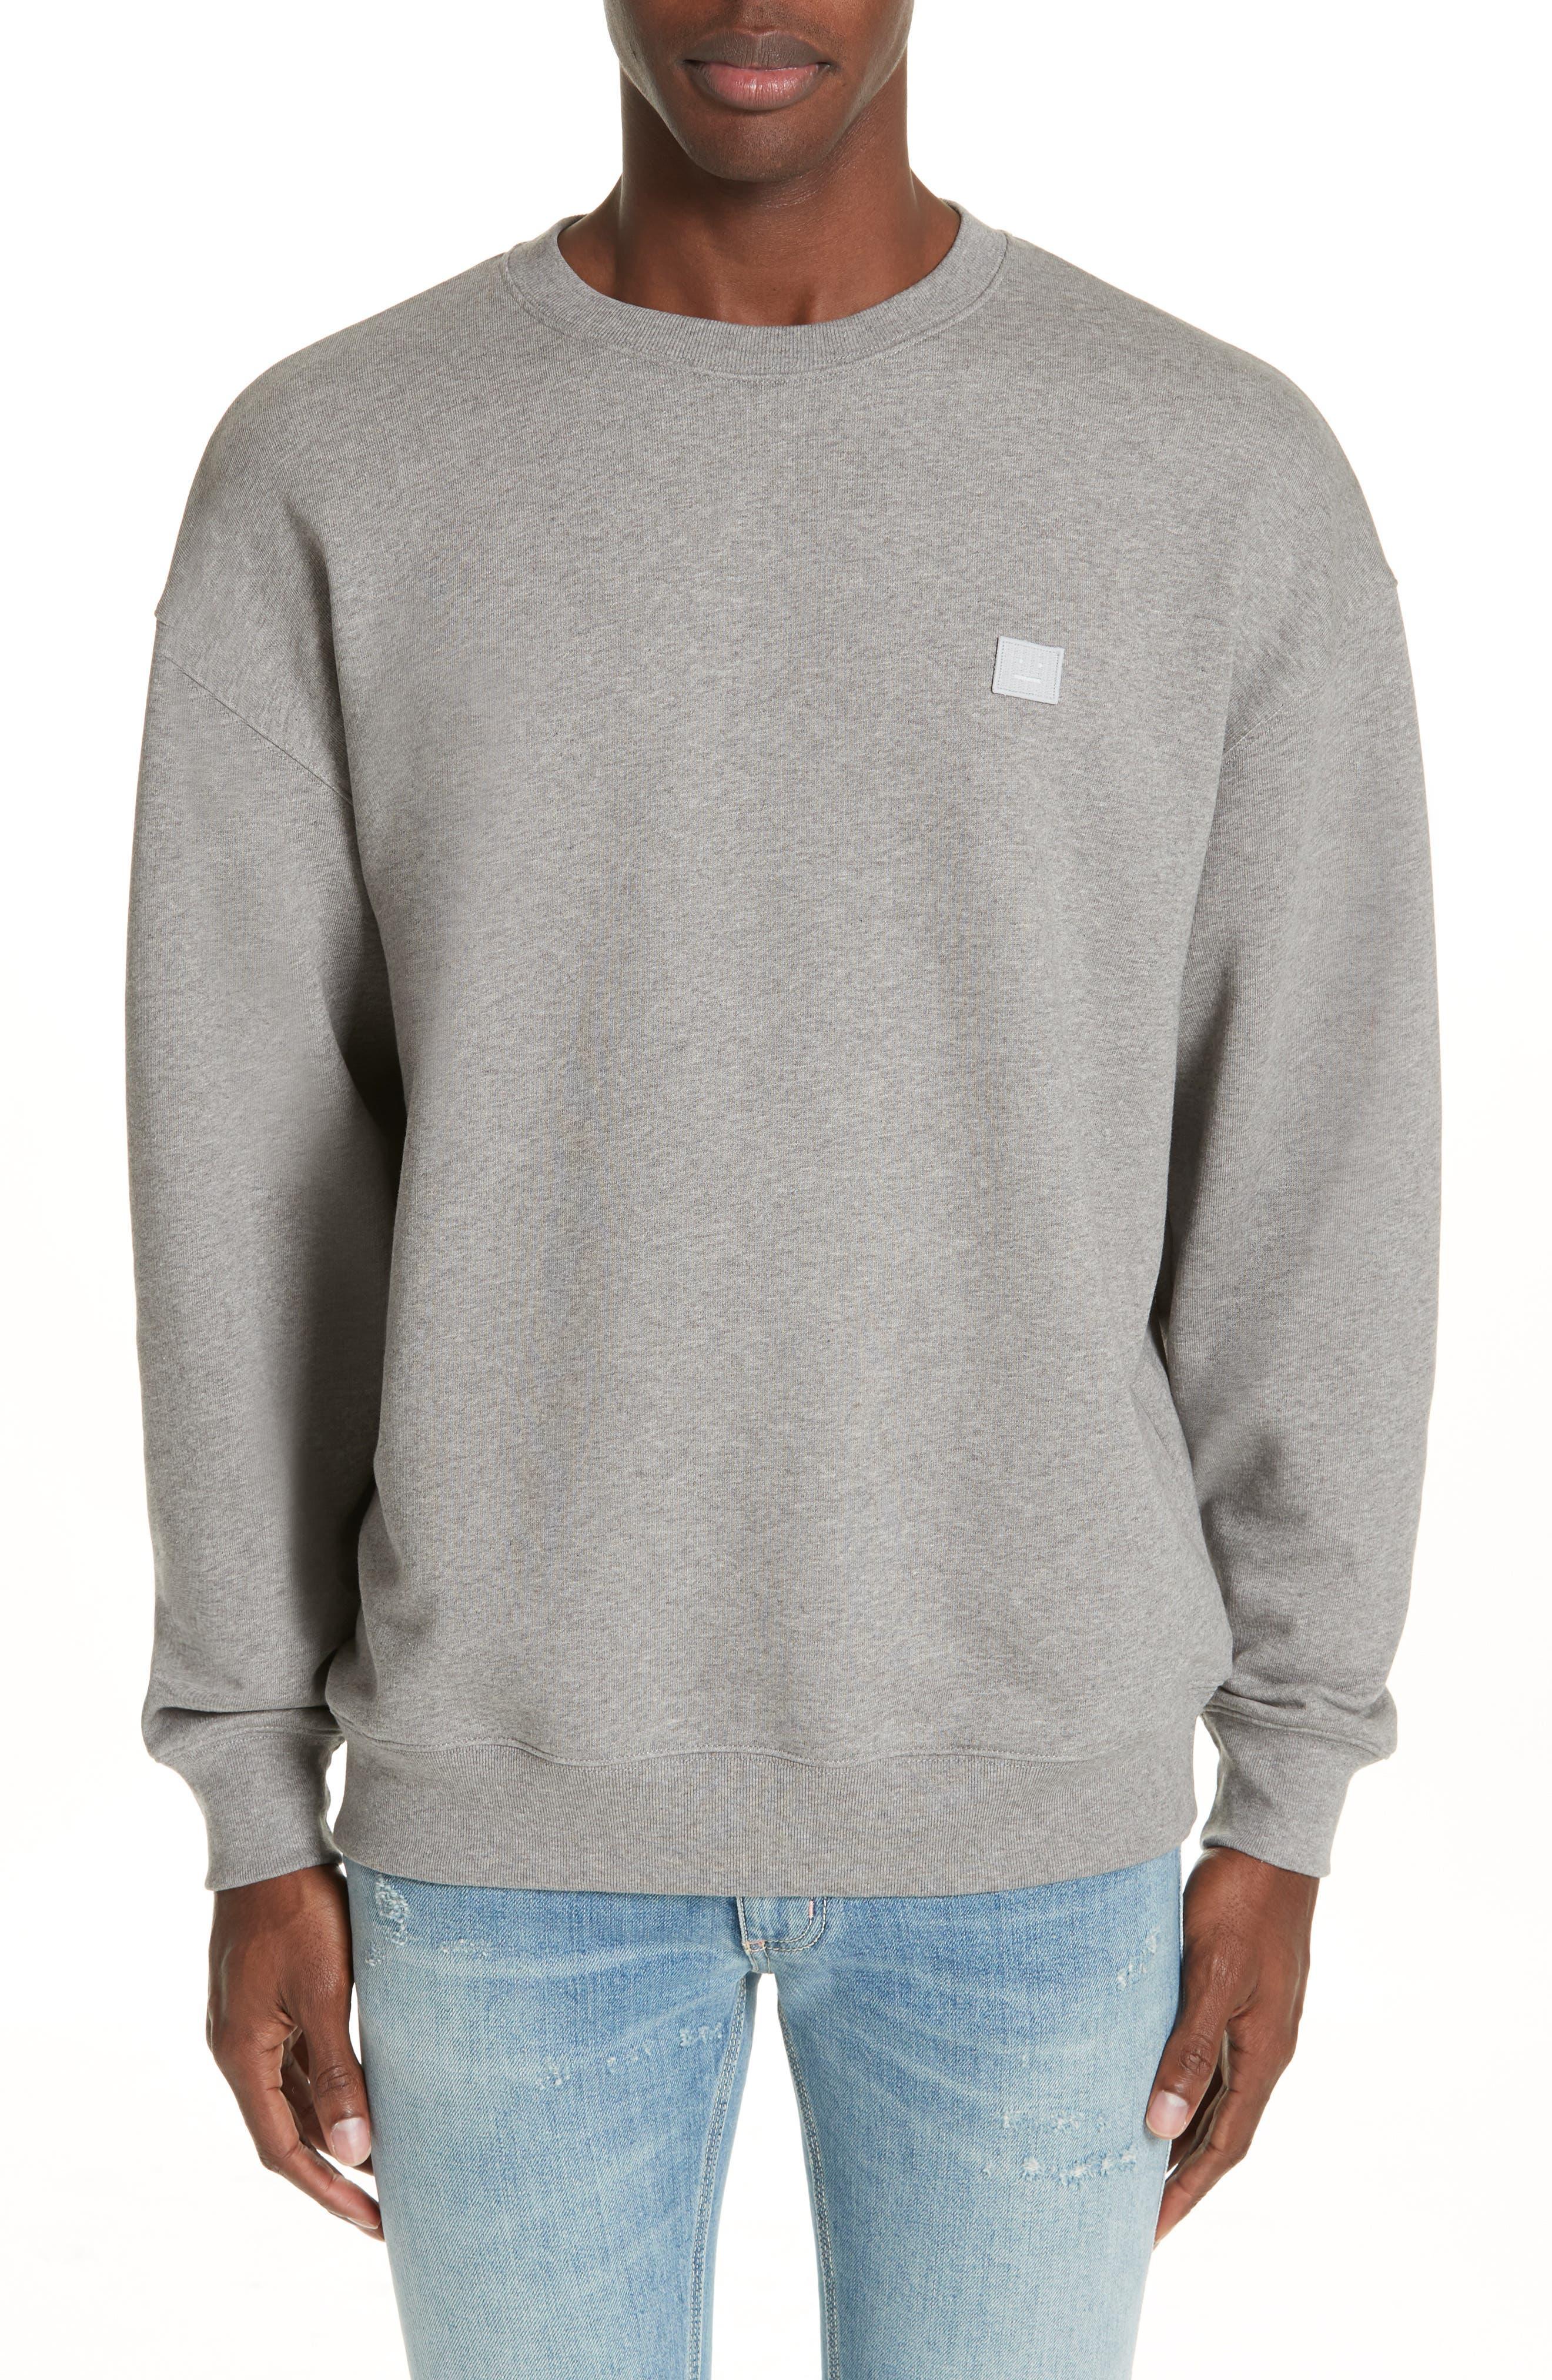 ACNE STUDIOS Forba Face Sweatshirt, Main, color, LIGHT GREY MELANGE